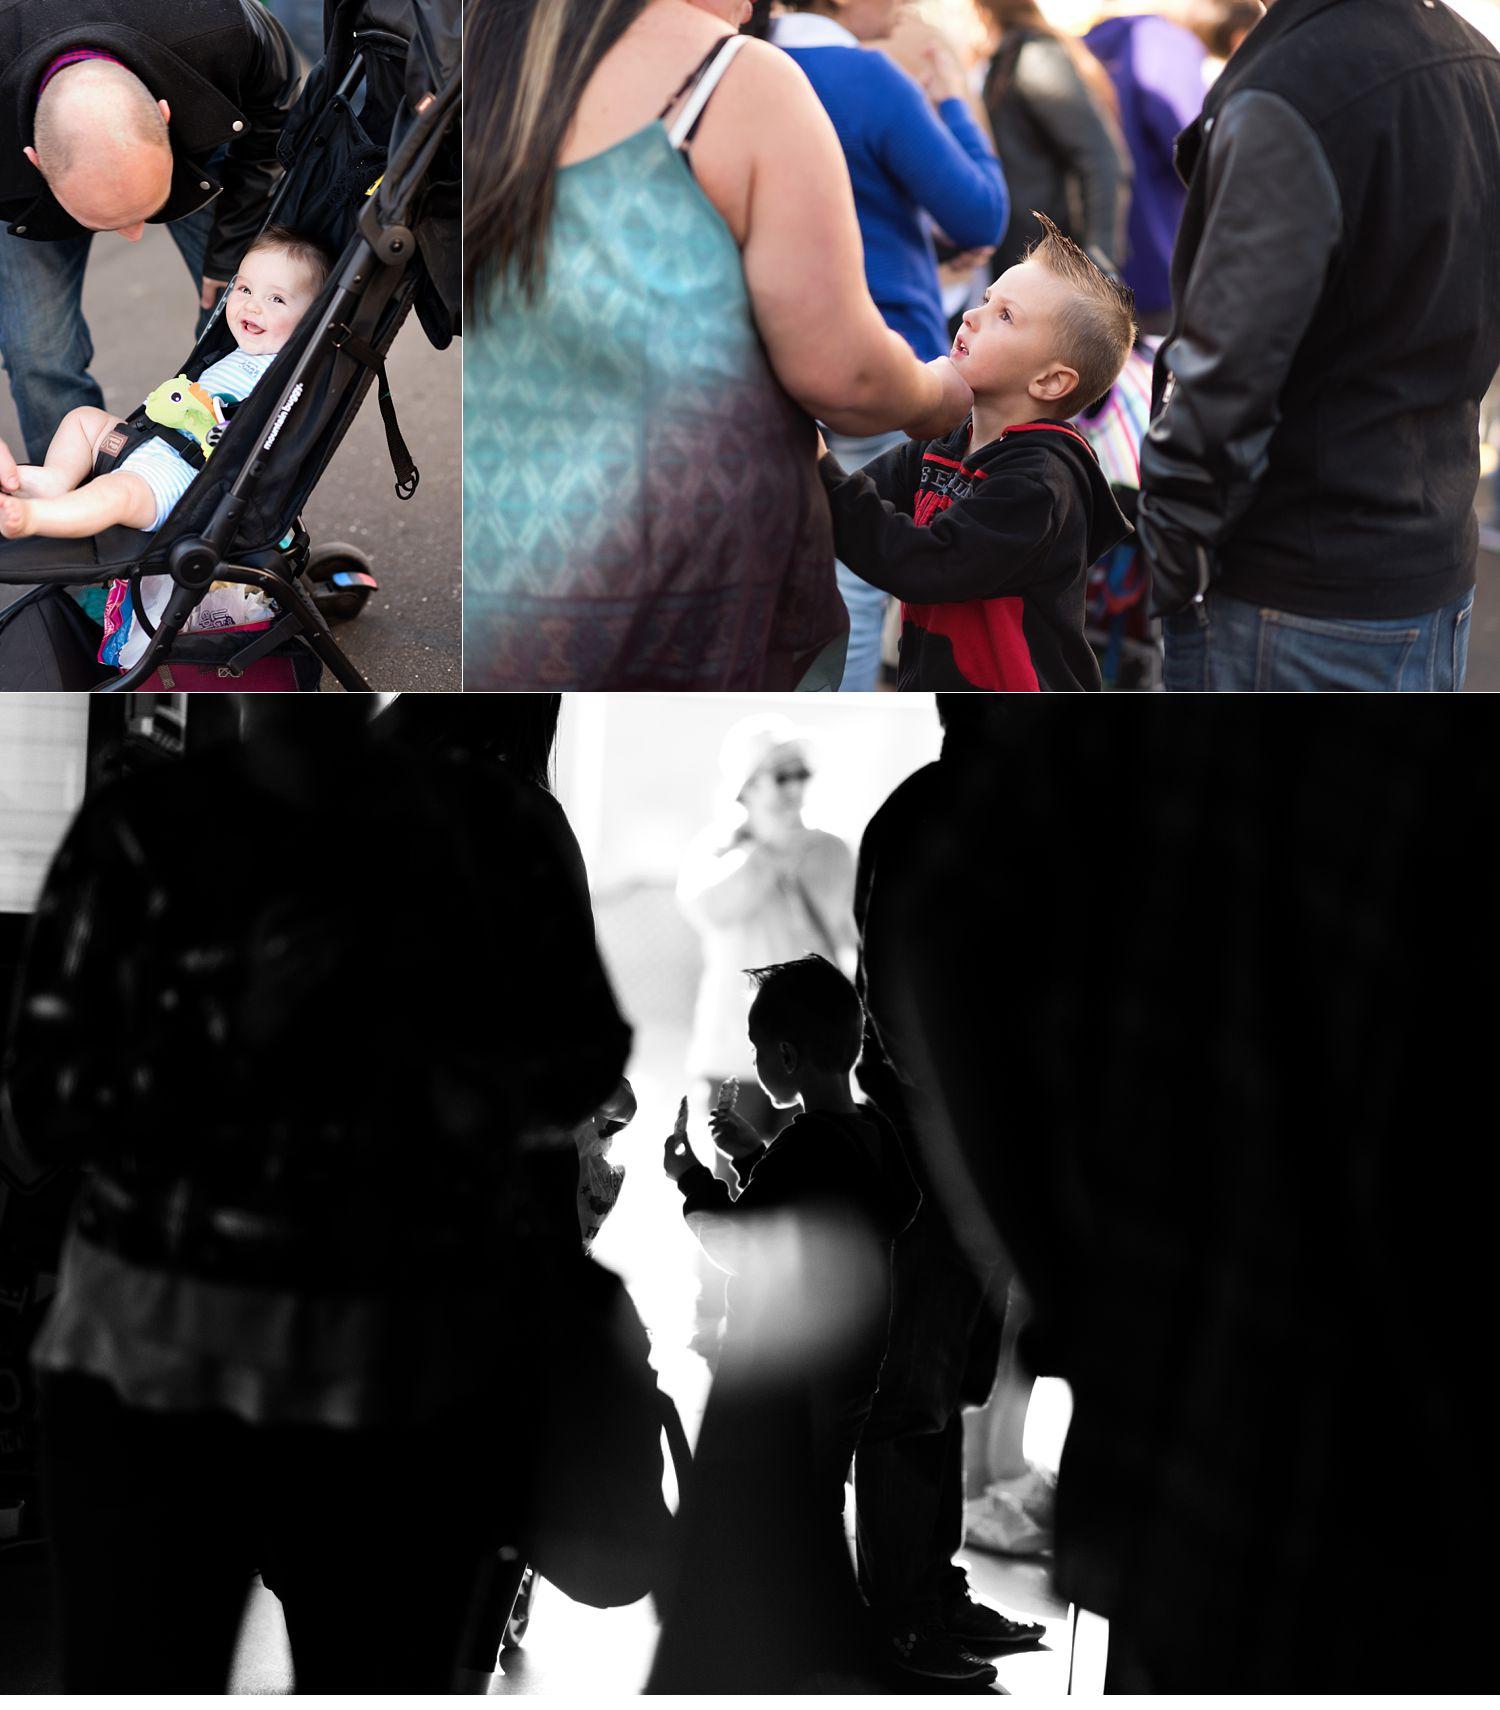 NATURAL-MOMENTS-FAMILY-PHOTOGRAPHY.jpg